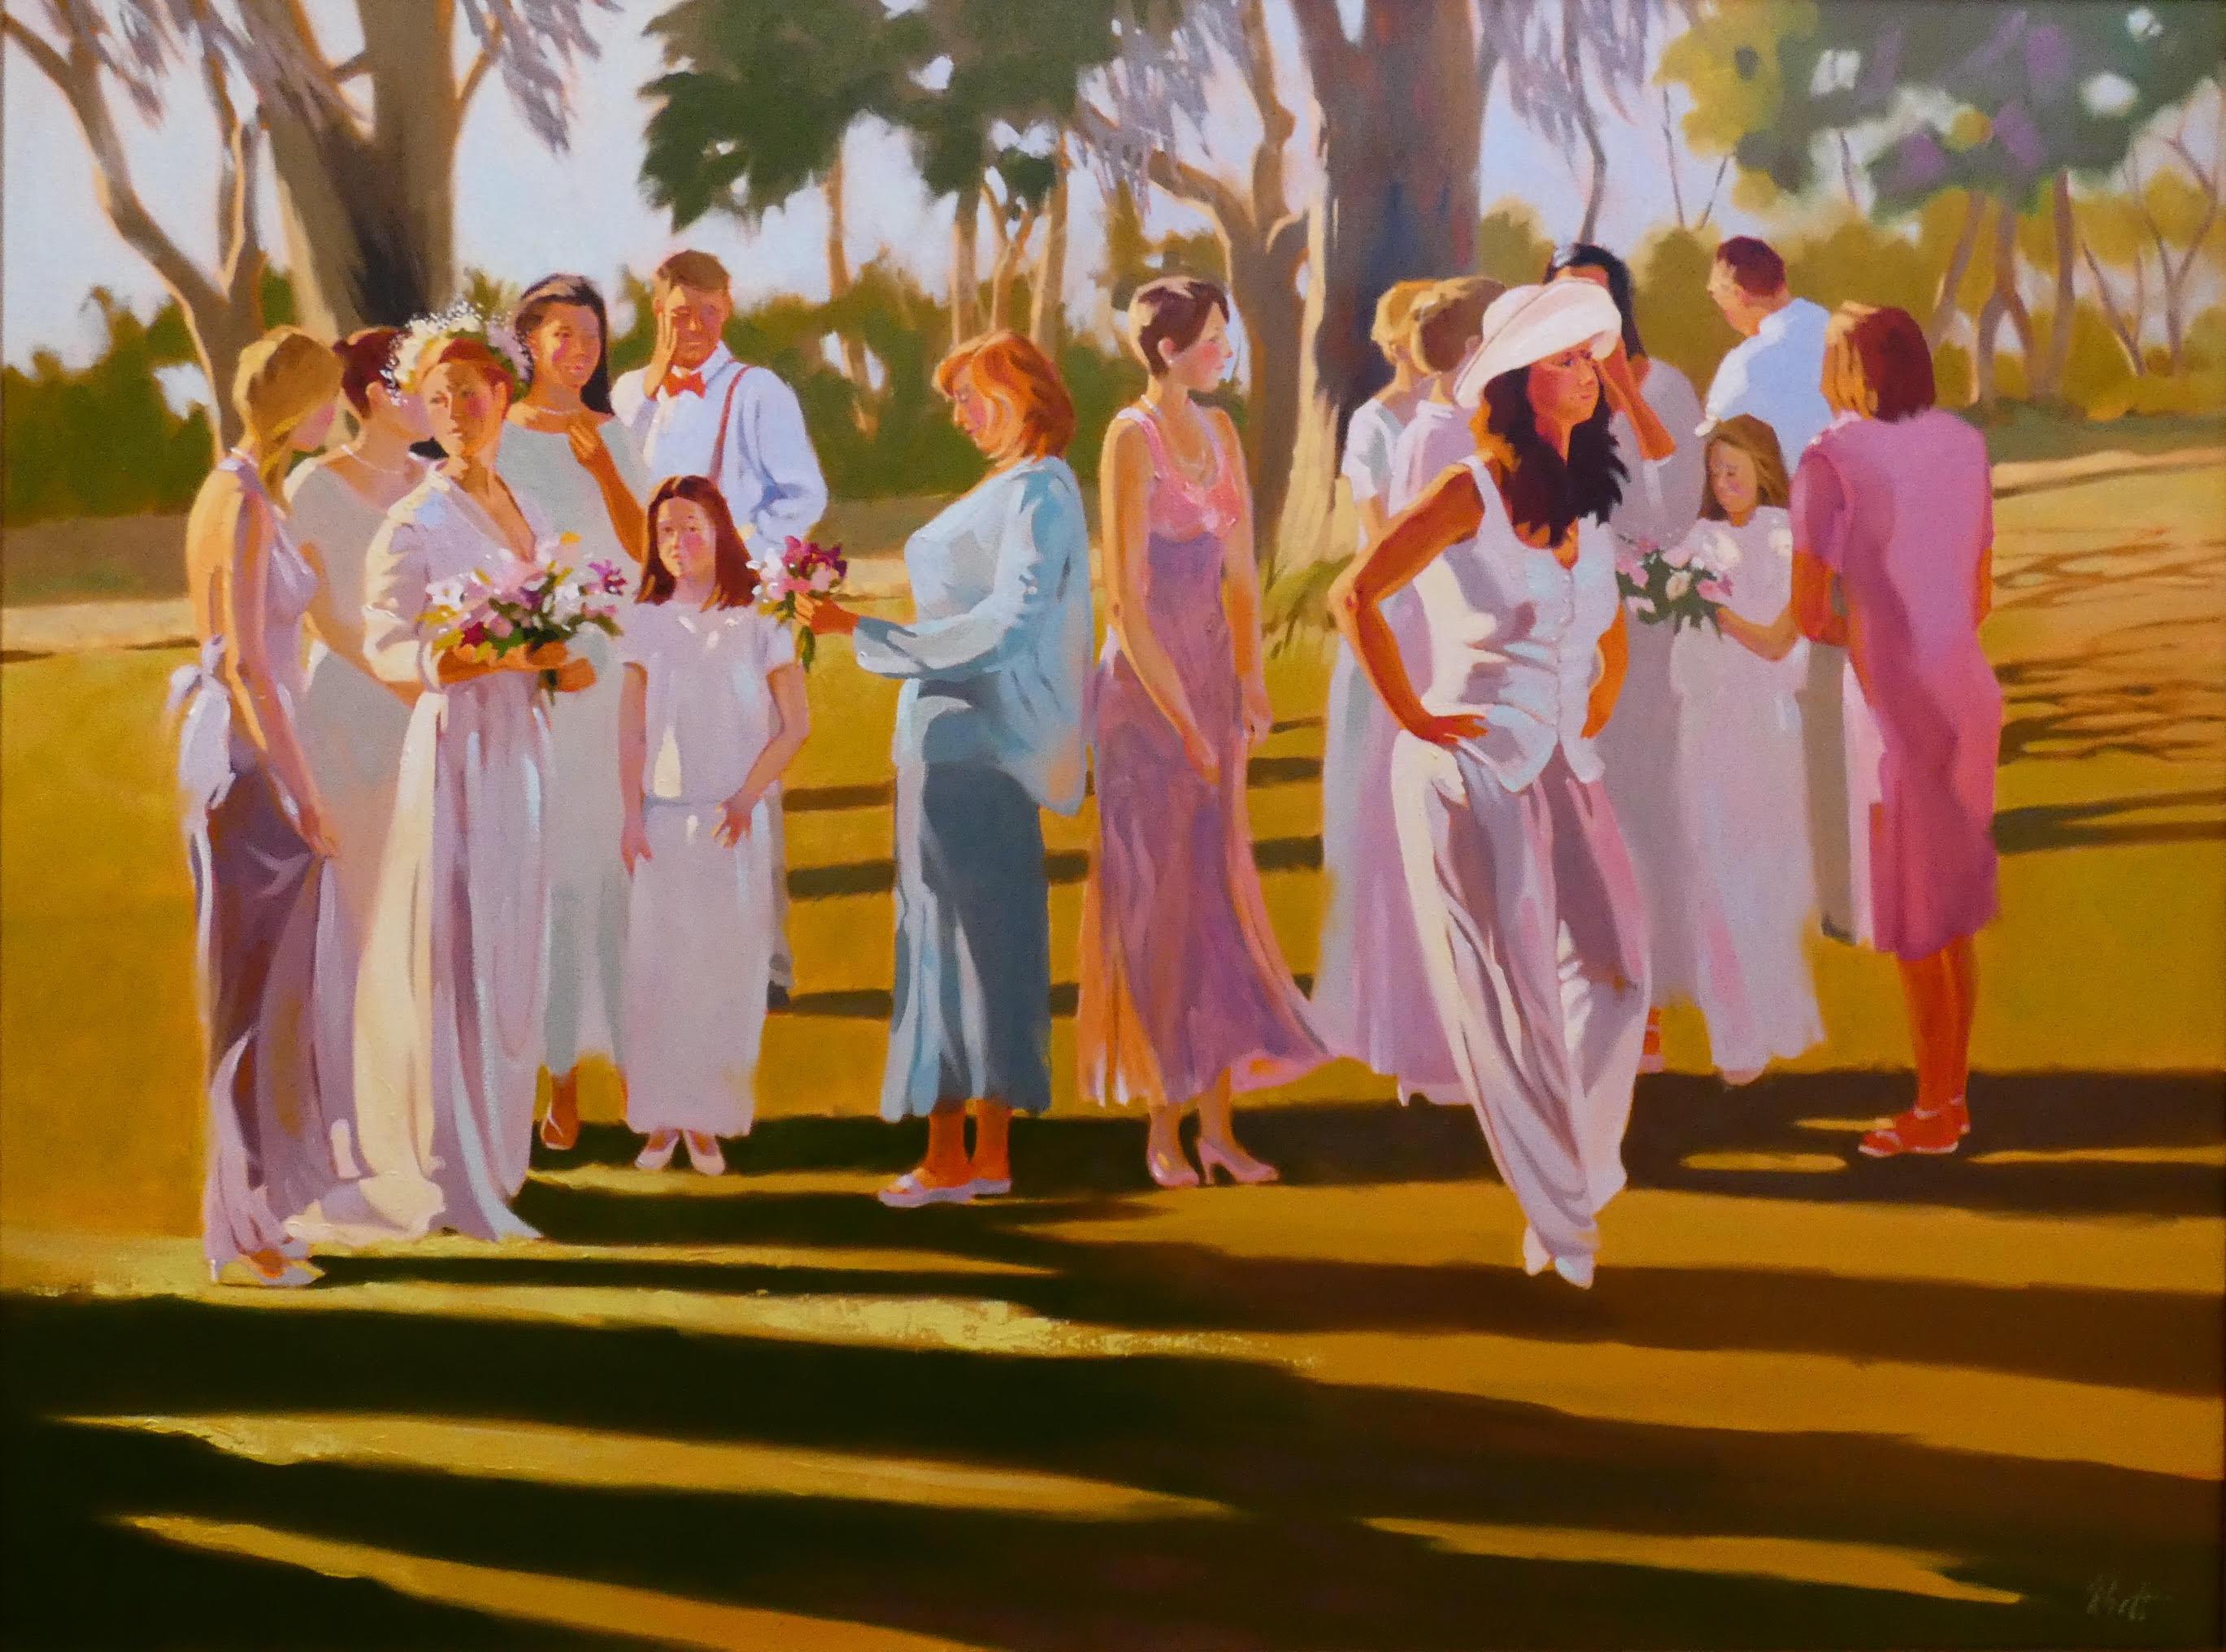 A Southern Wedding, 36 x 48